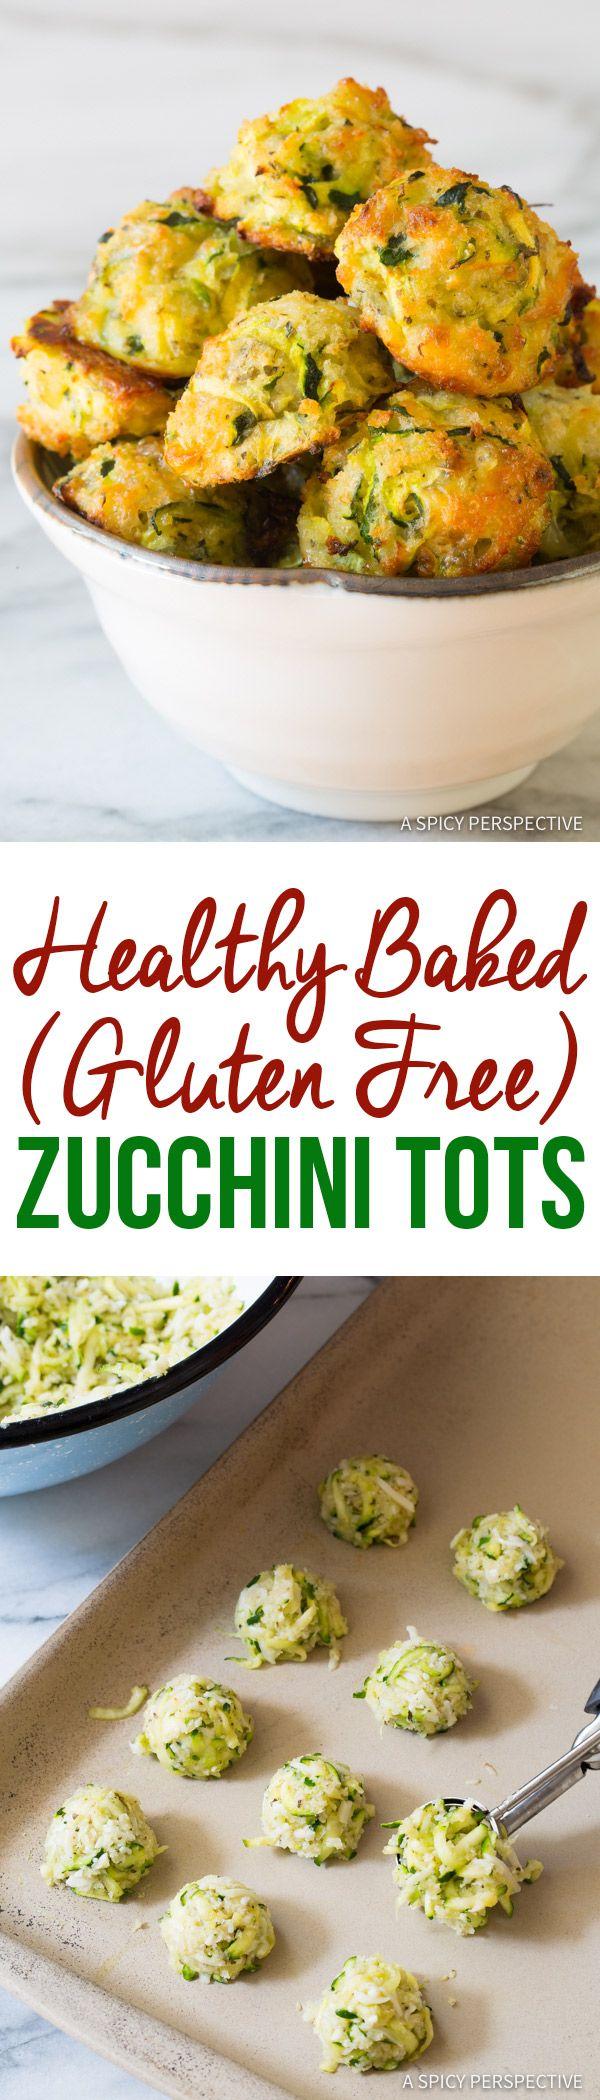 6-Ingredient Healthy Baked Zucchini Tots (Gluten Free!)   ASpicyPerspective.com